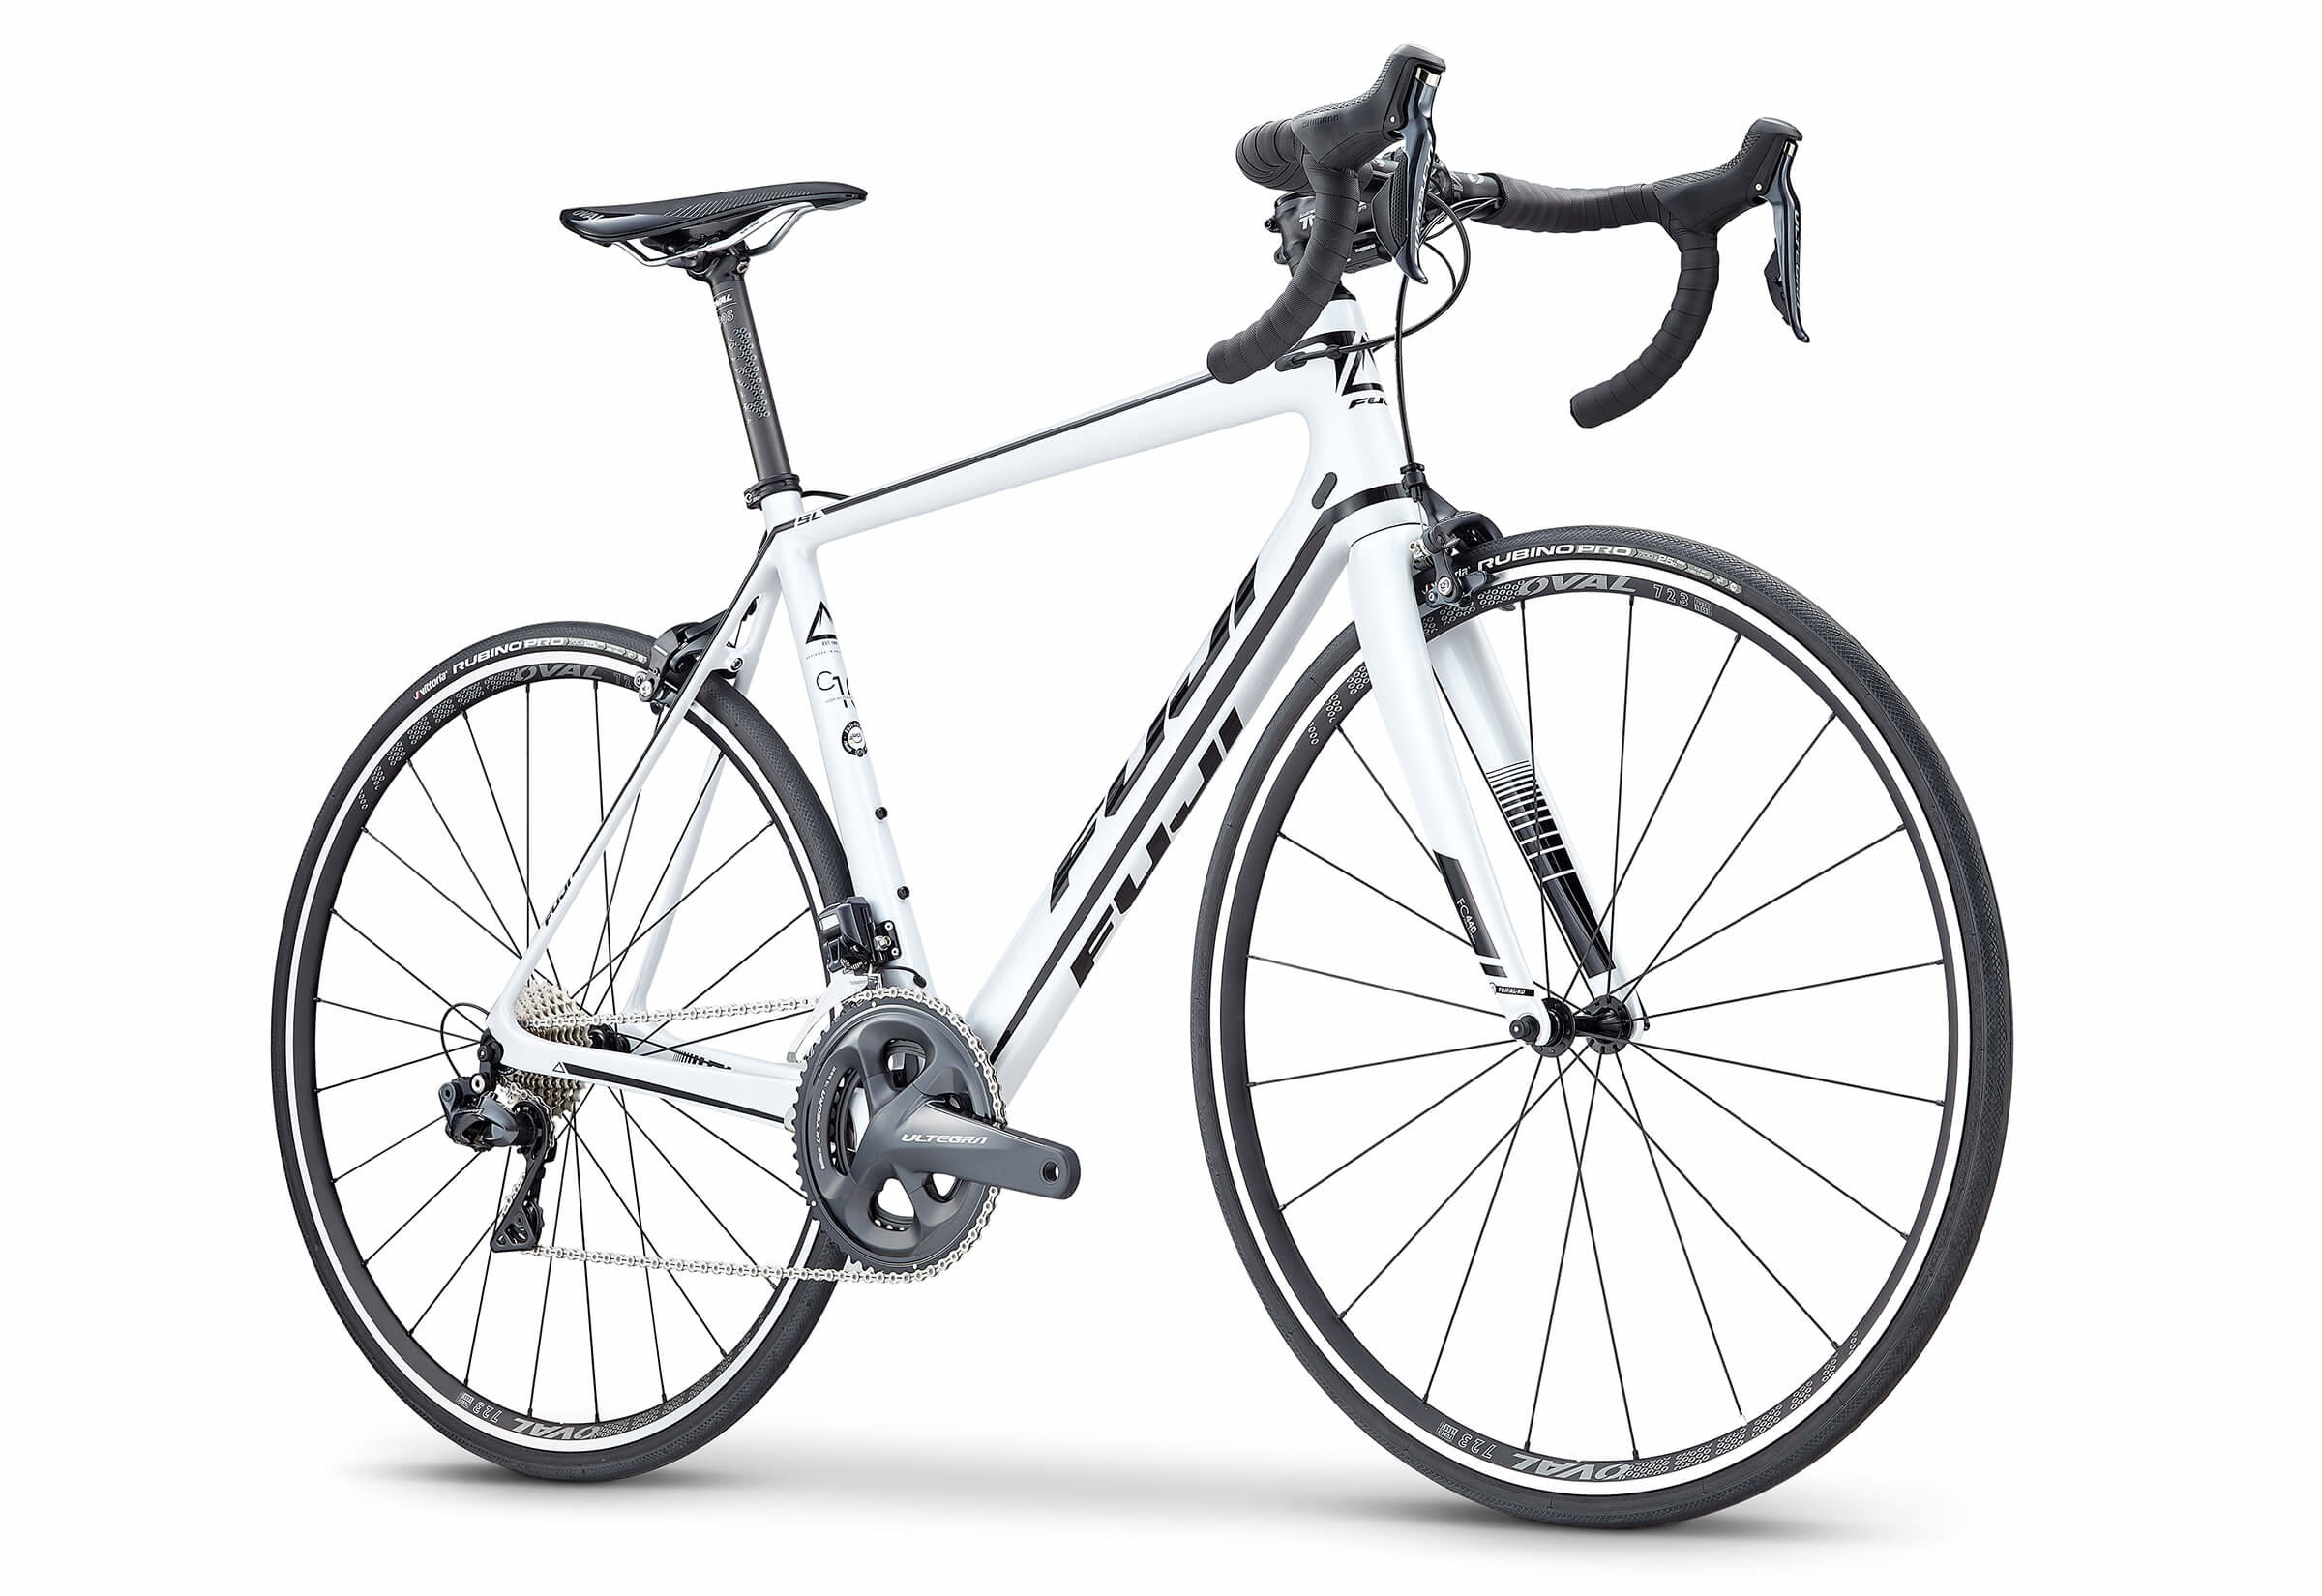 fc8f42af0c6 Fuji SL 2.1 - Don's Bicycles